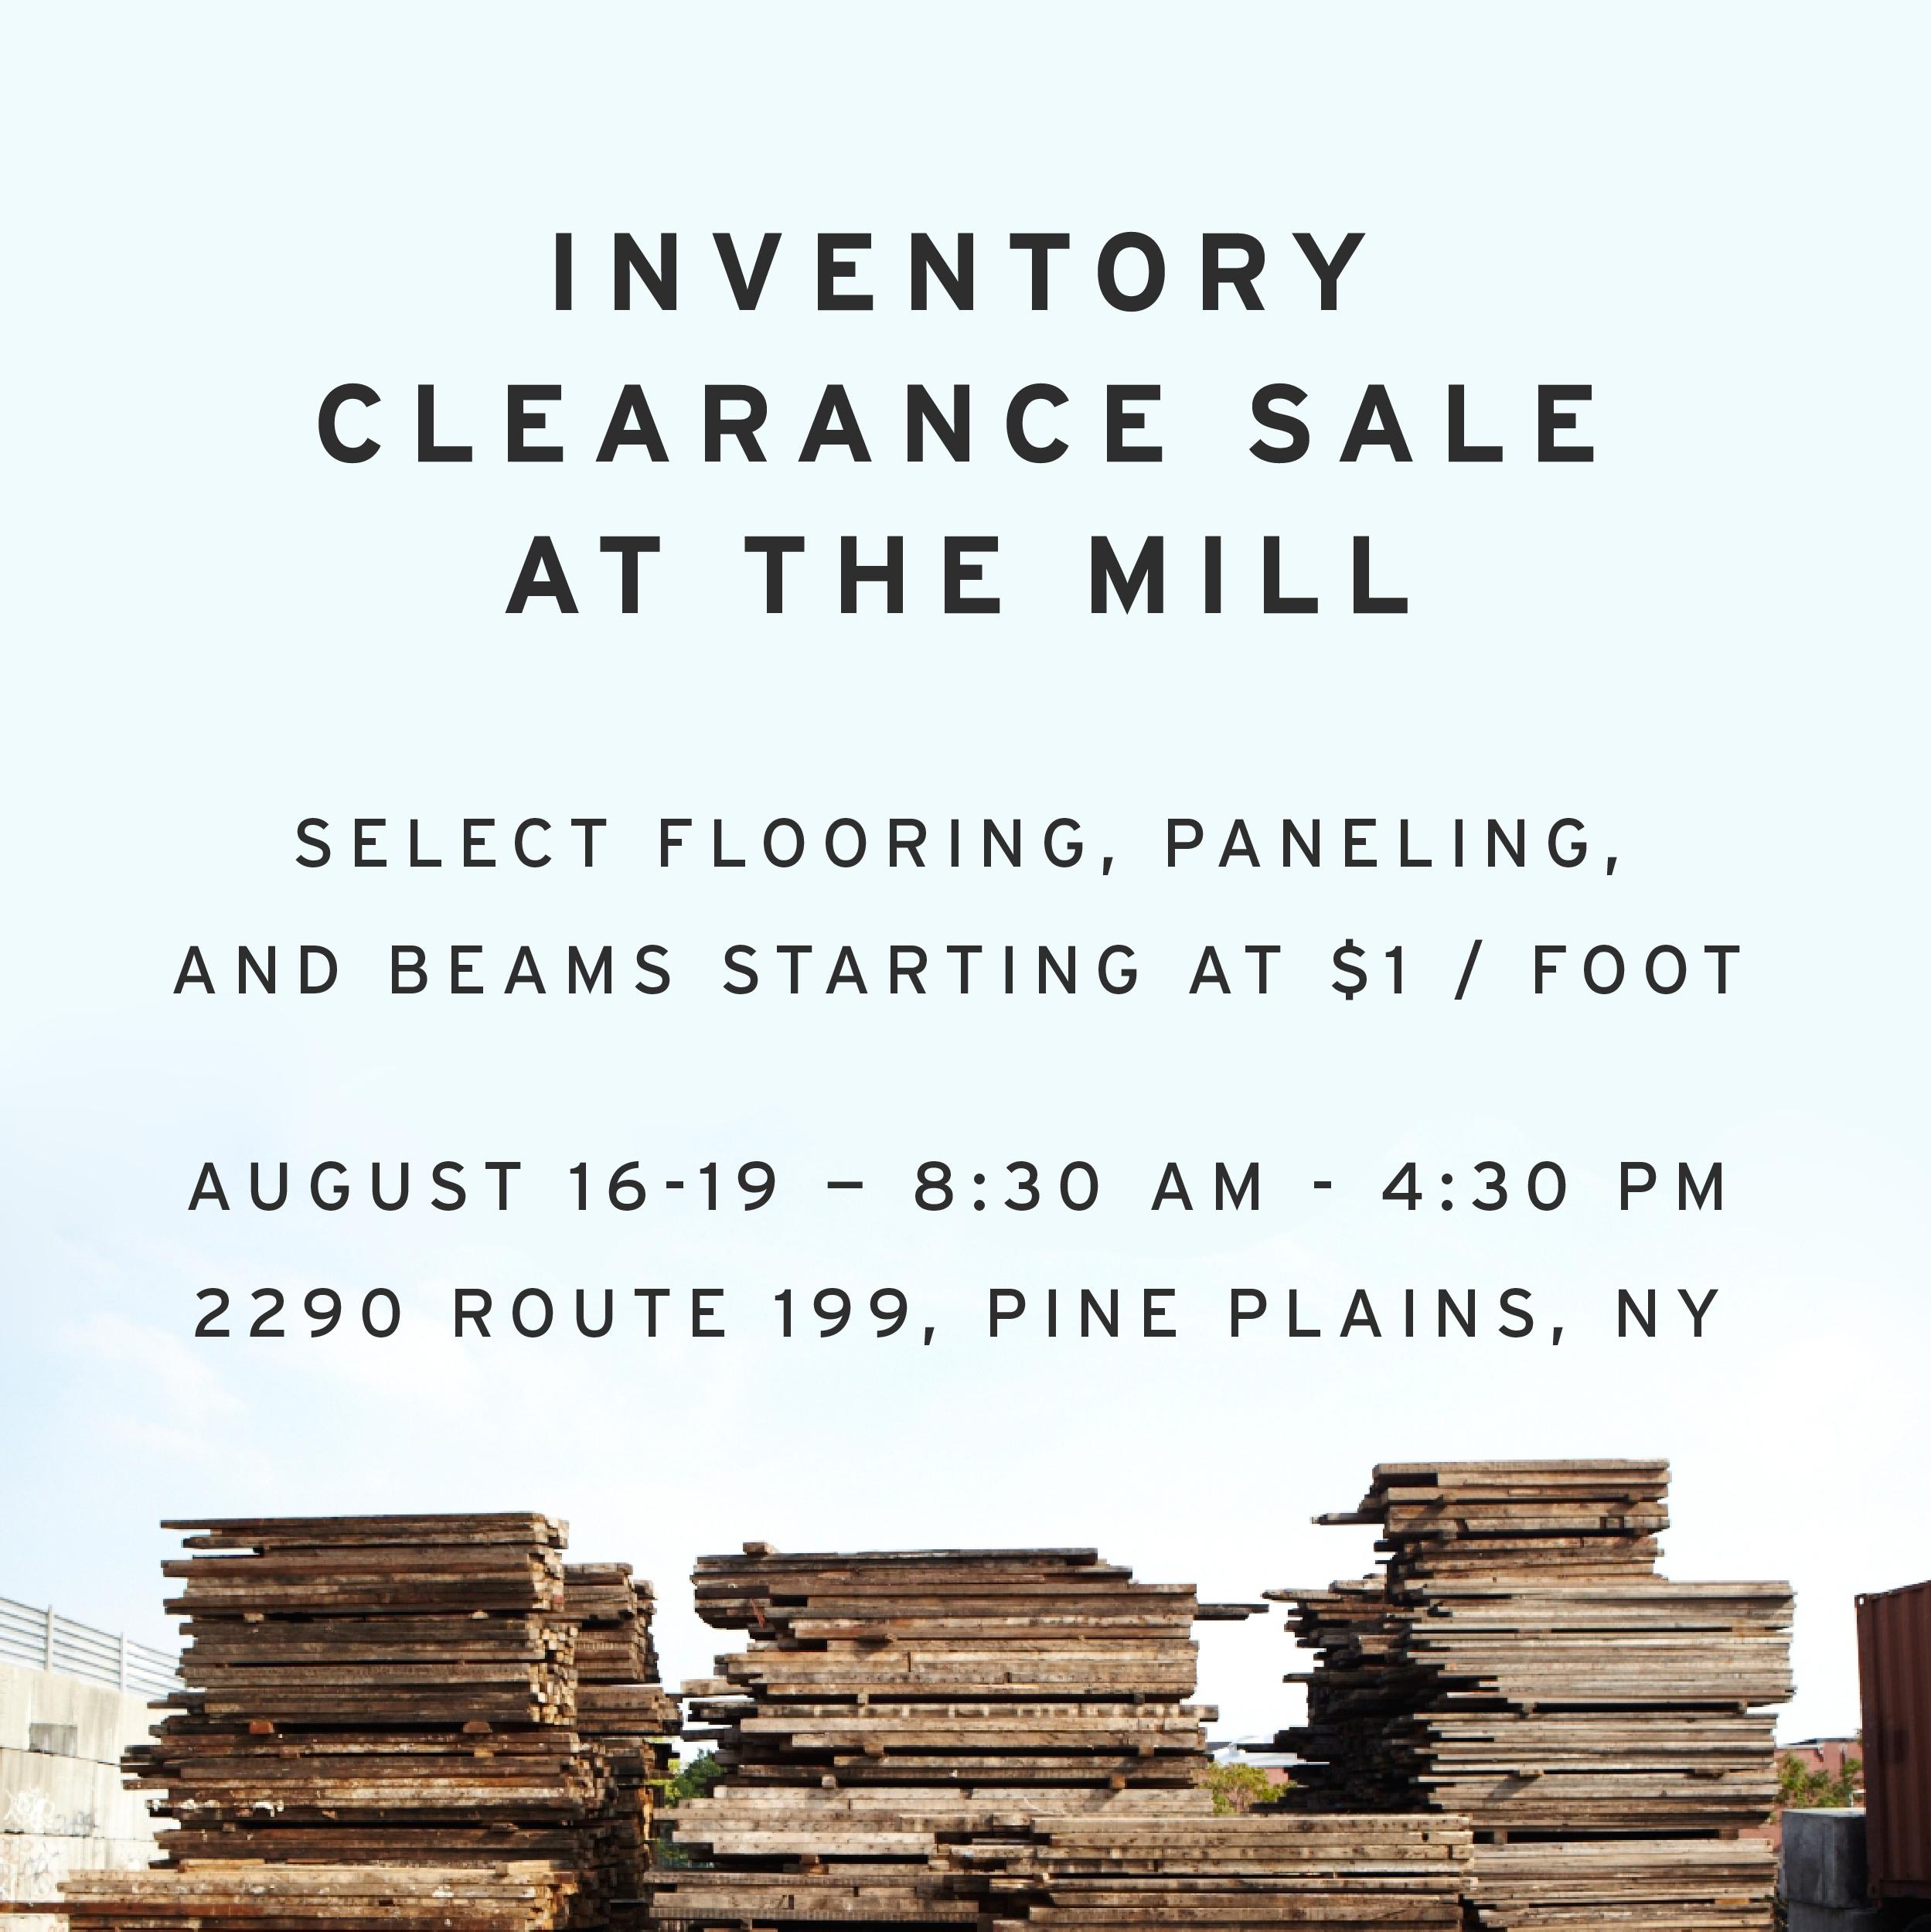 moving.inventory.sale.instagram_vv  copy 10.jpg